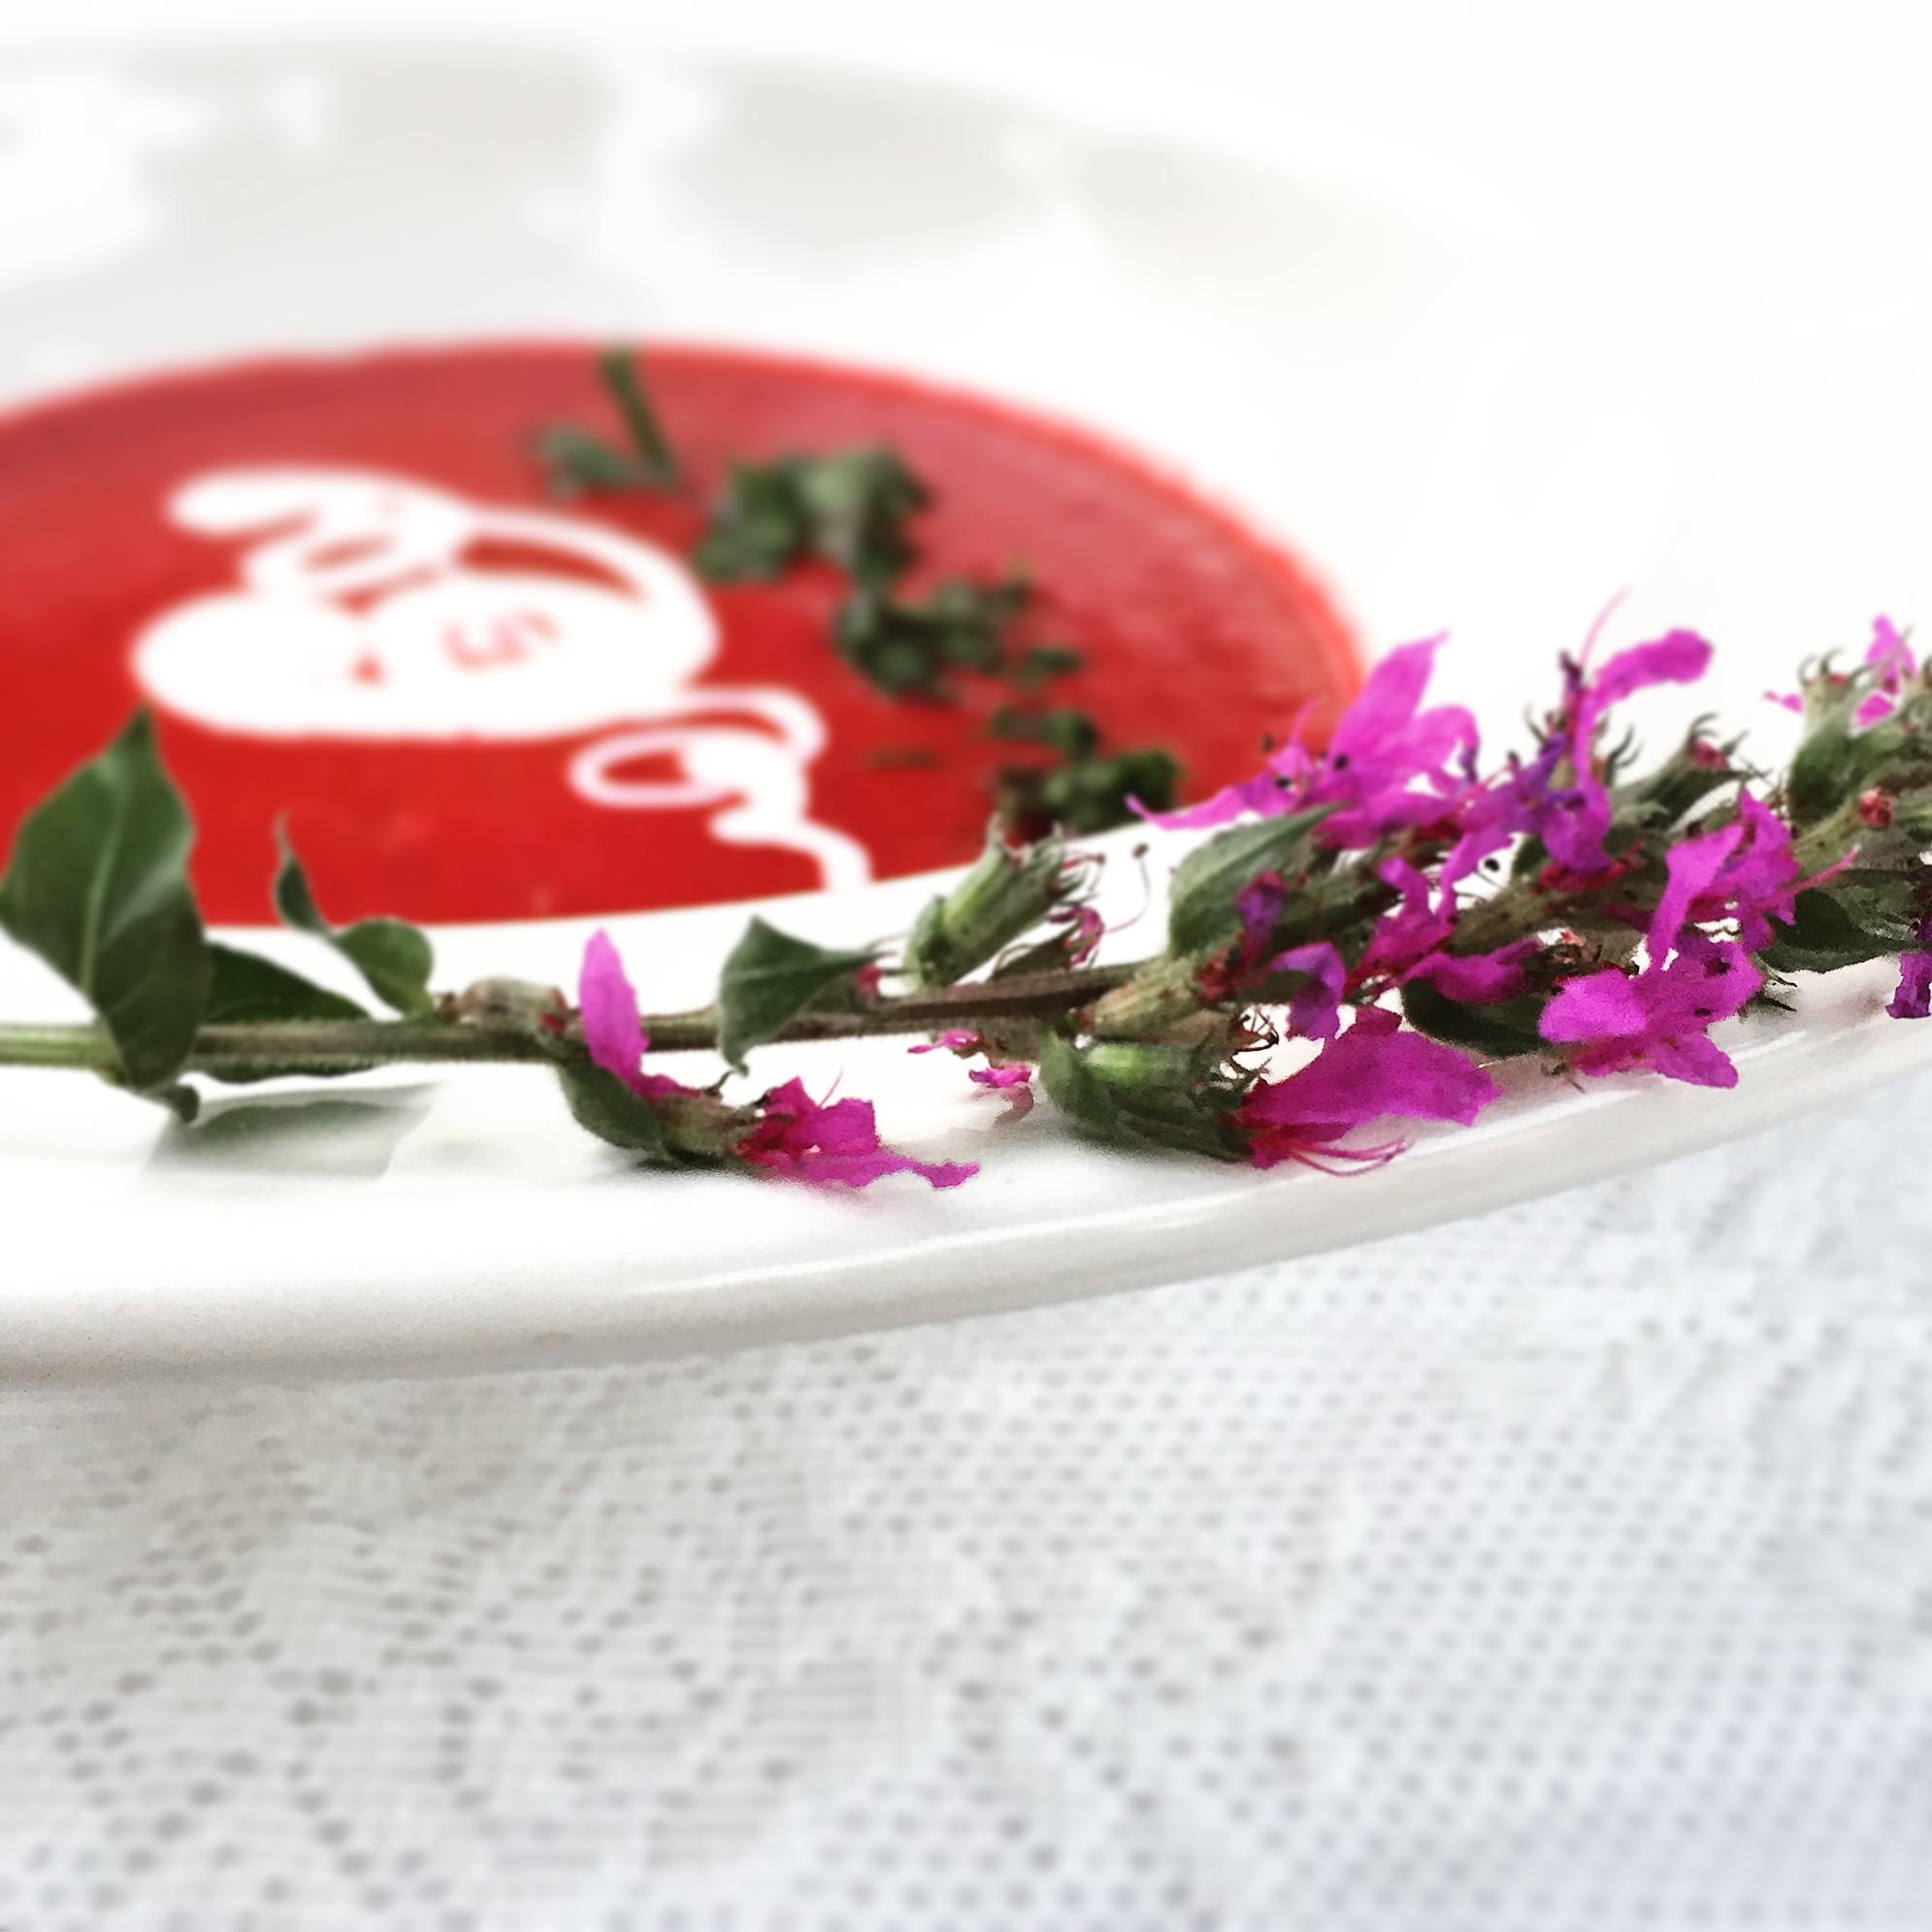 Foodfotografie food styling1